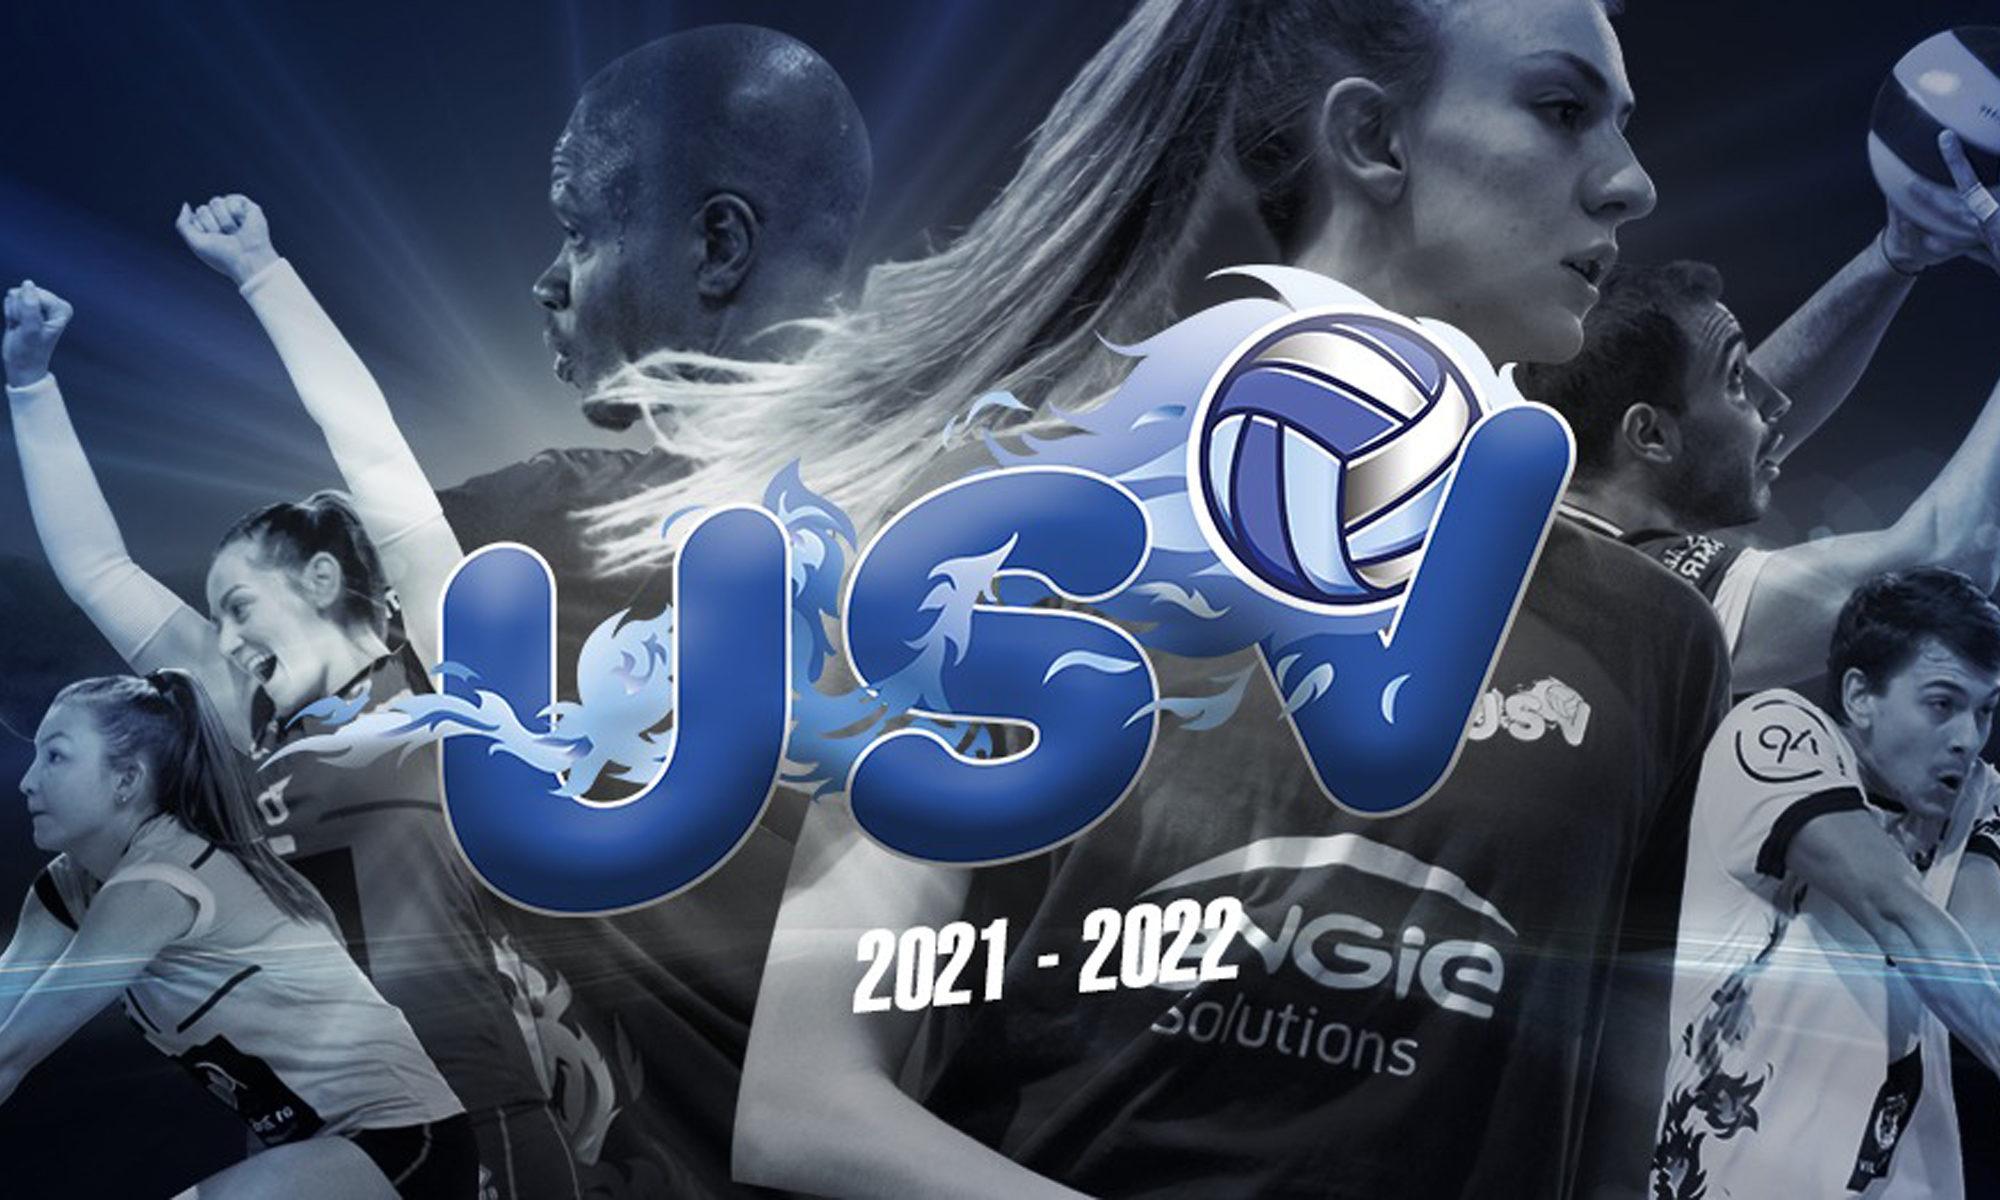 US Villejuif Volley 94